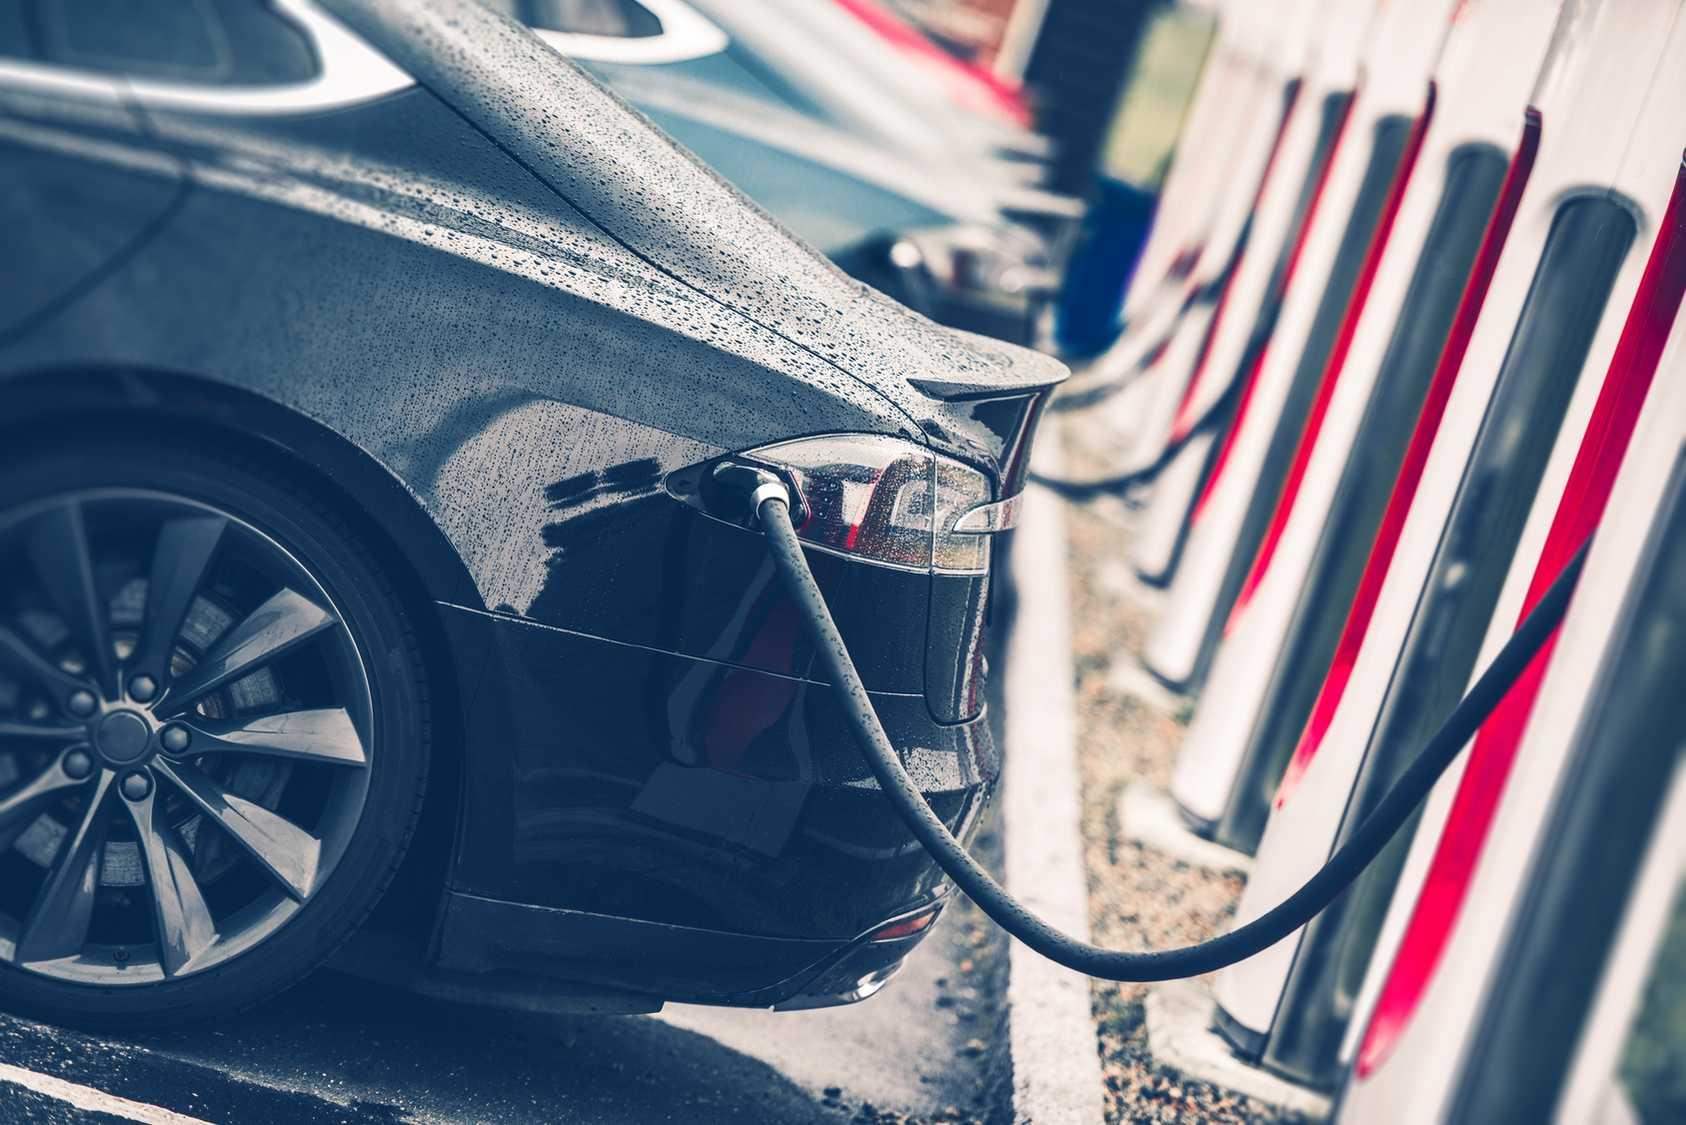 thermoforming EV automotive applications blog